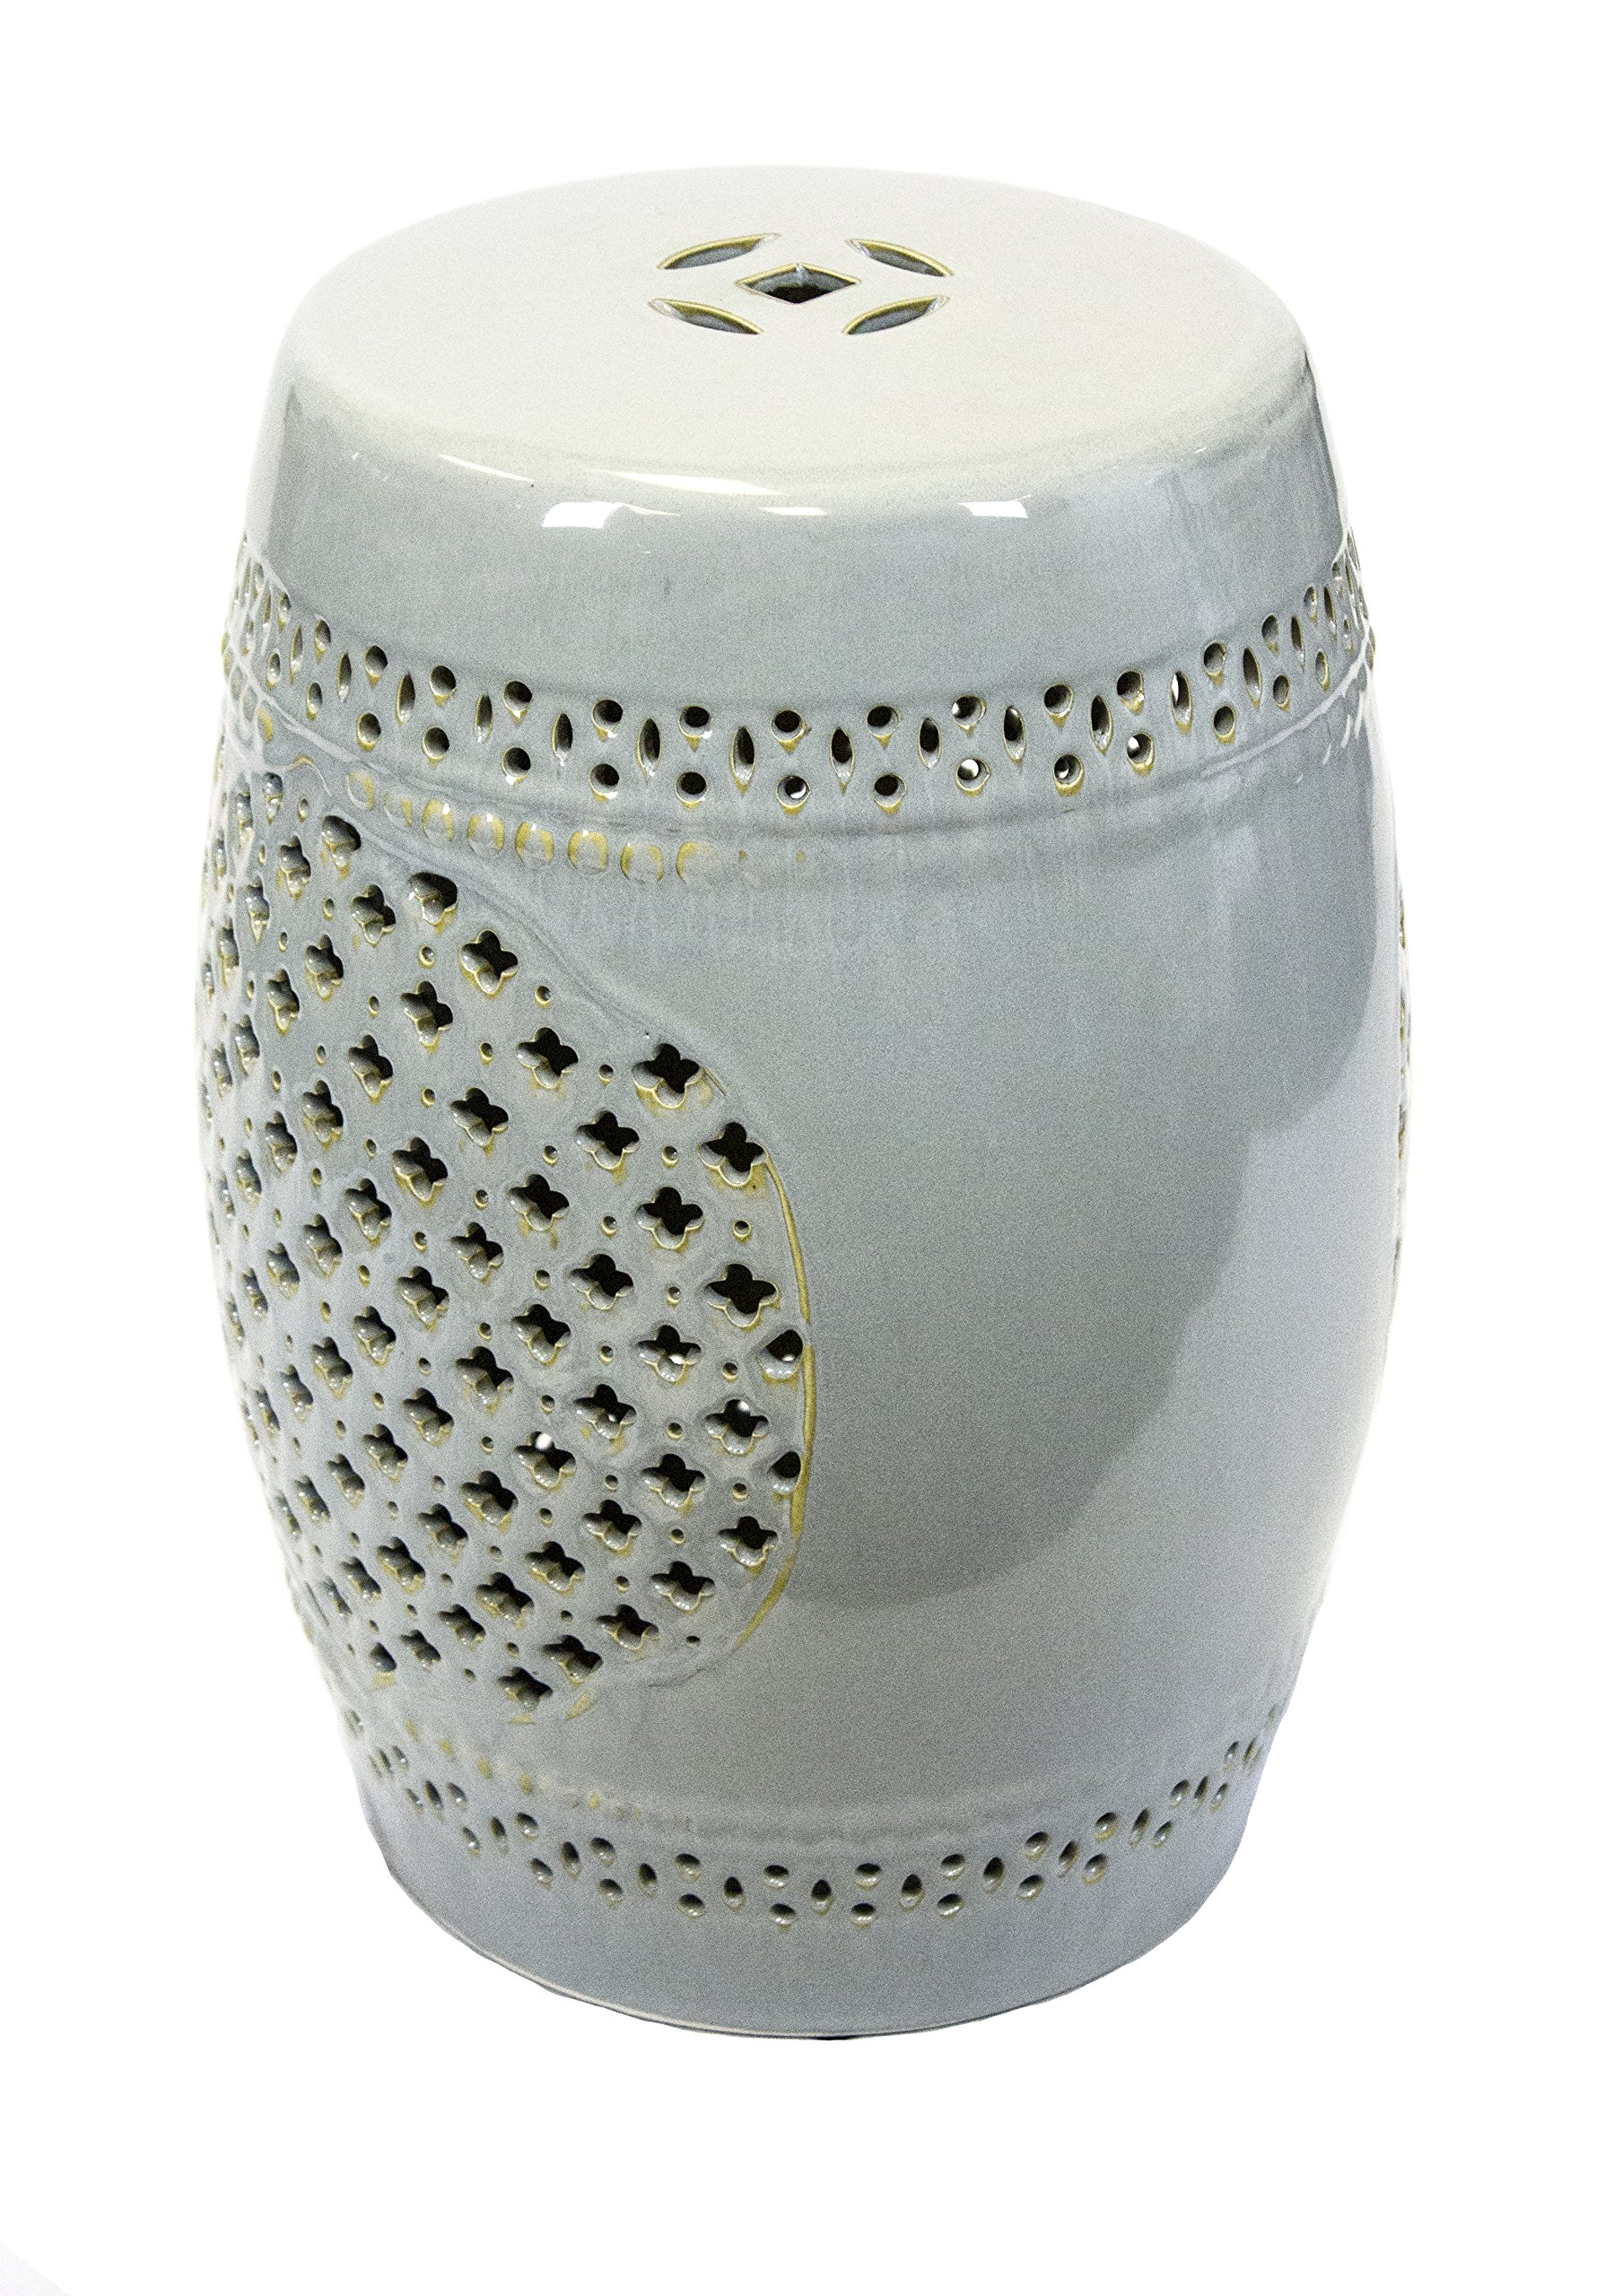 Sagebrook Home FC10449-01 Pierced Garden Stool, White/Gold Ceramic, 12.5 x 12.5 x 17.5 Inches